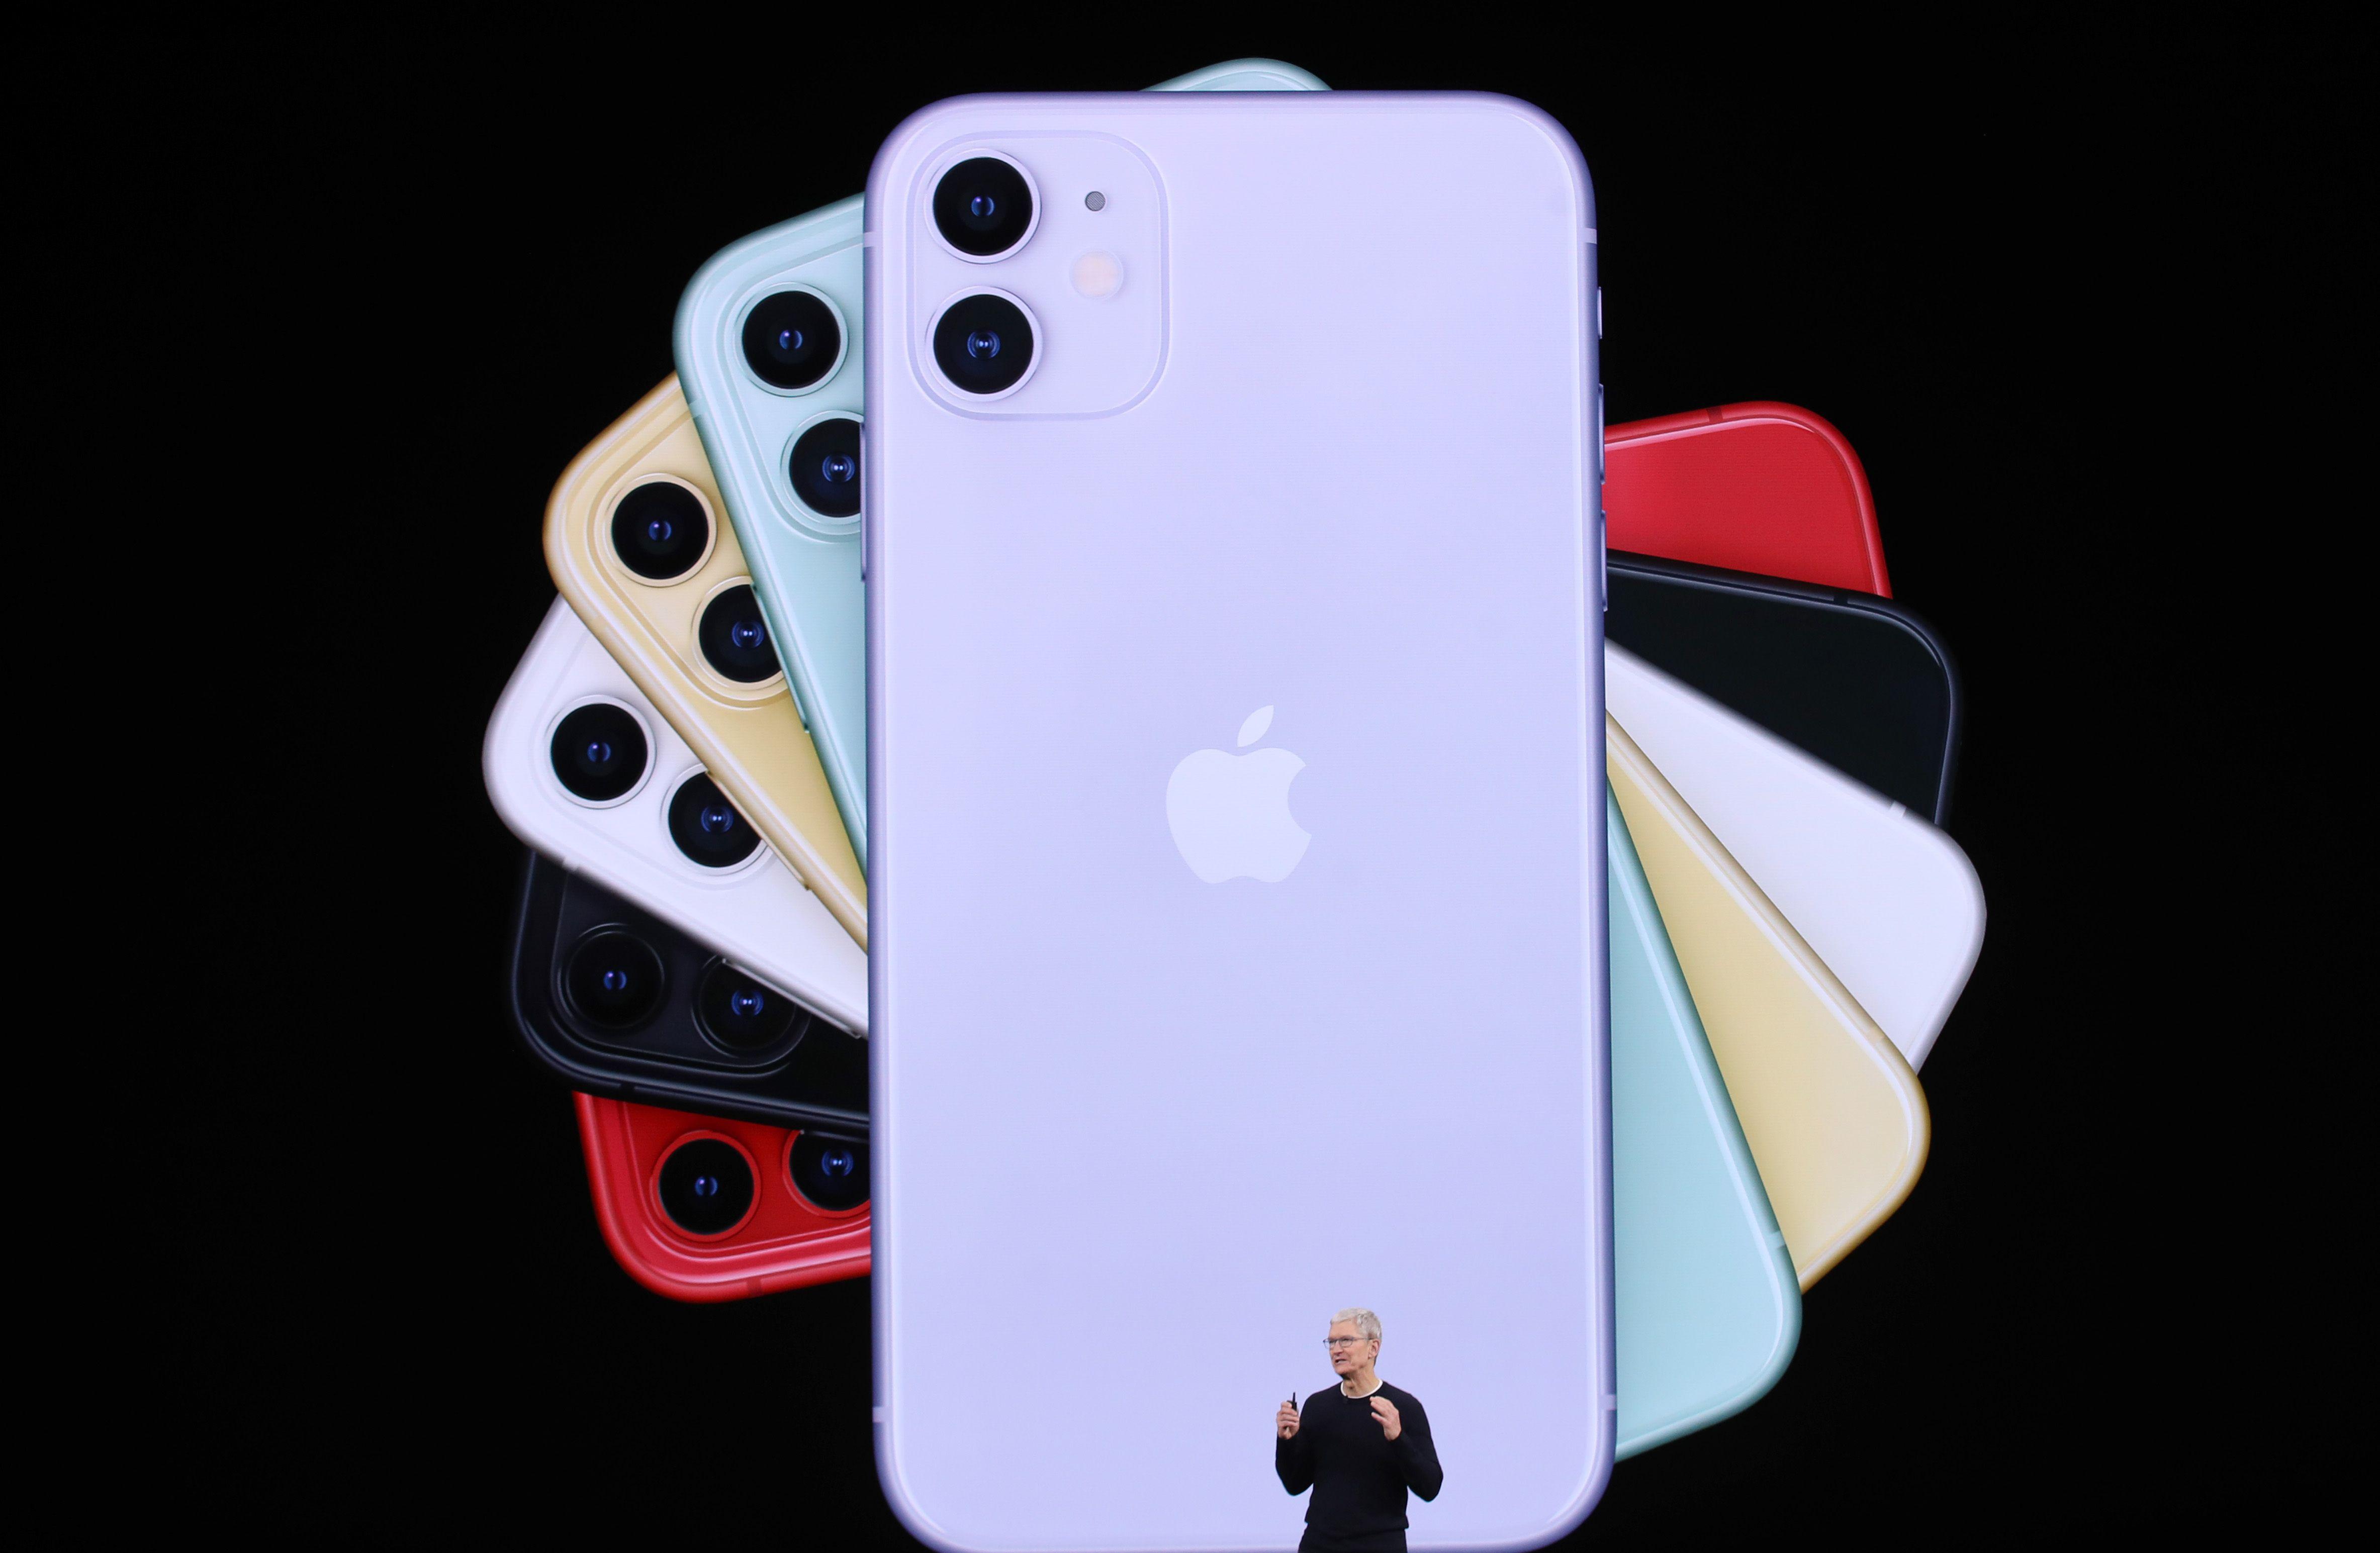 iphone 11 pro steve jobs one last thing